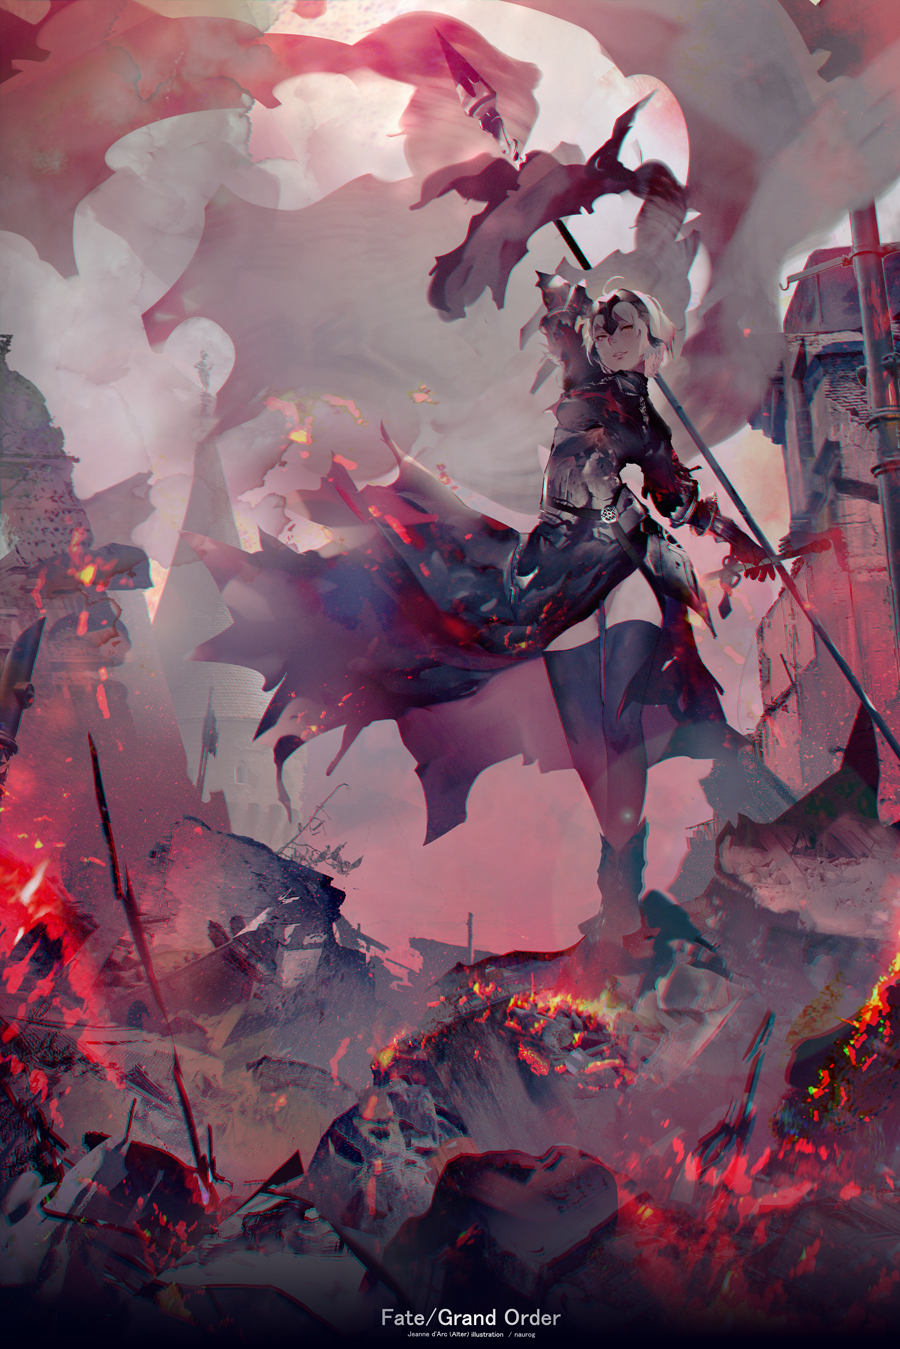 Fate Grandorder Jeanne D Arc Alter Naurogのイラスト Arte De Anime Personajes De Fantasia